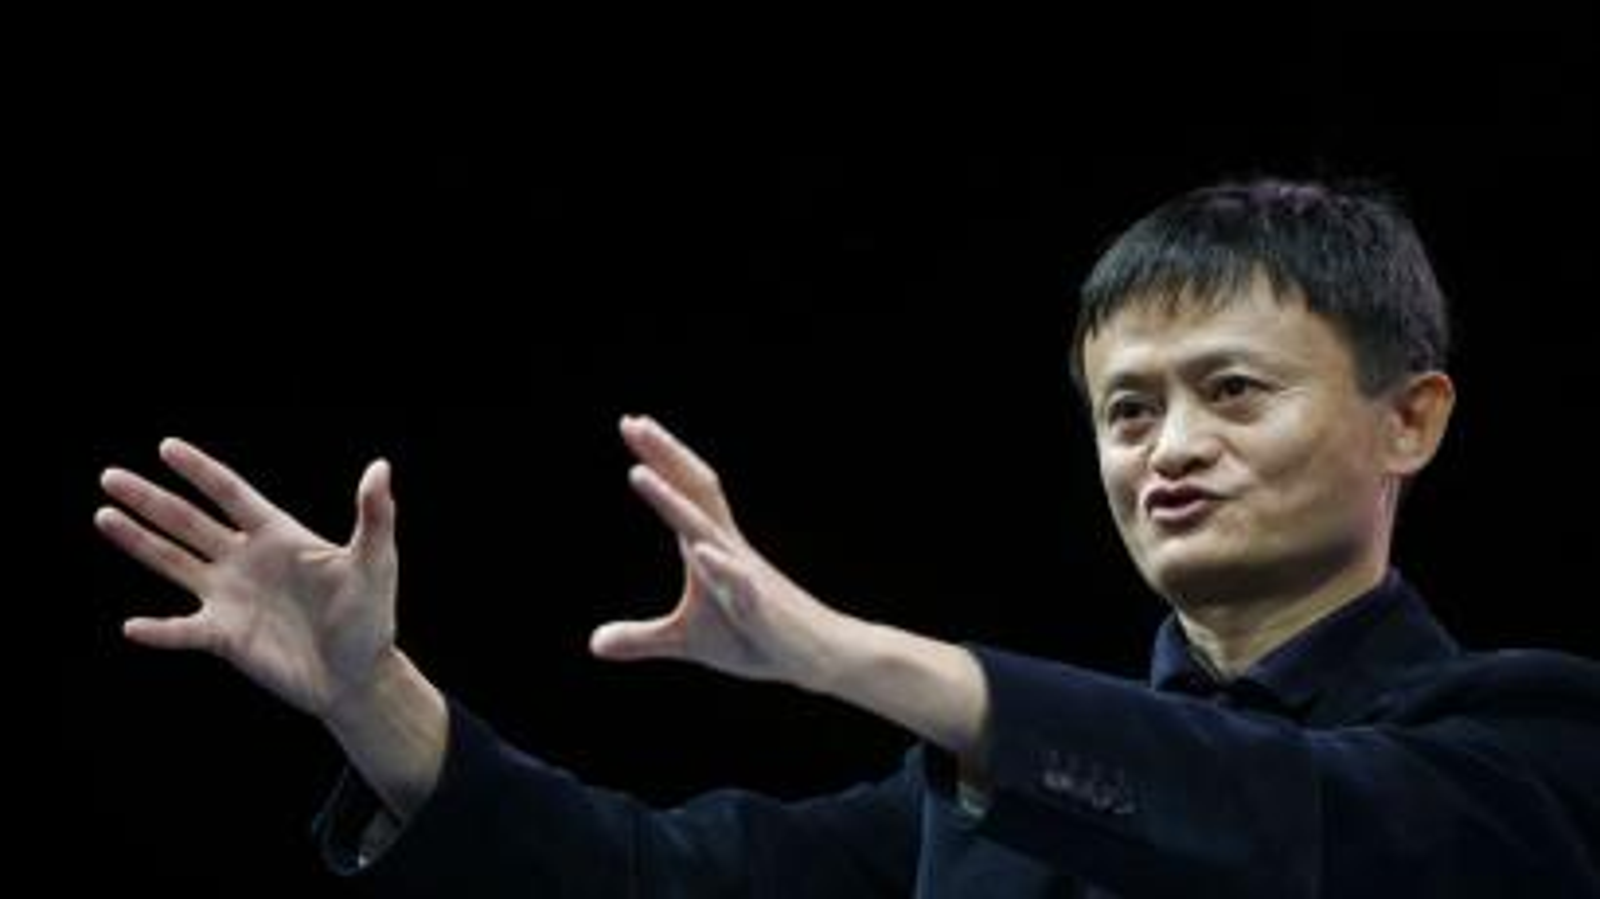 Jack-Ma-Alibaba-India